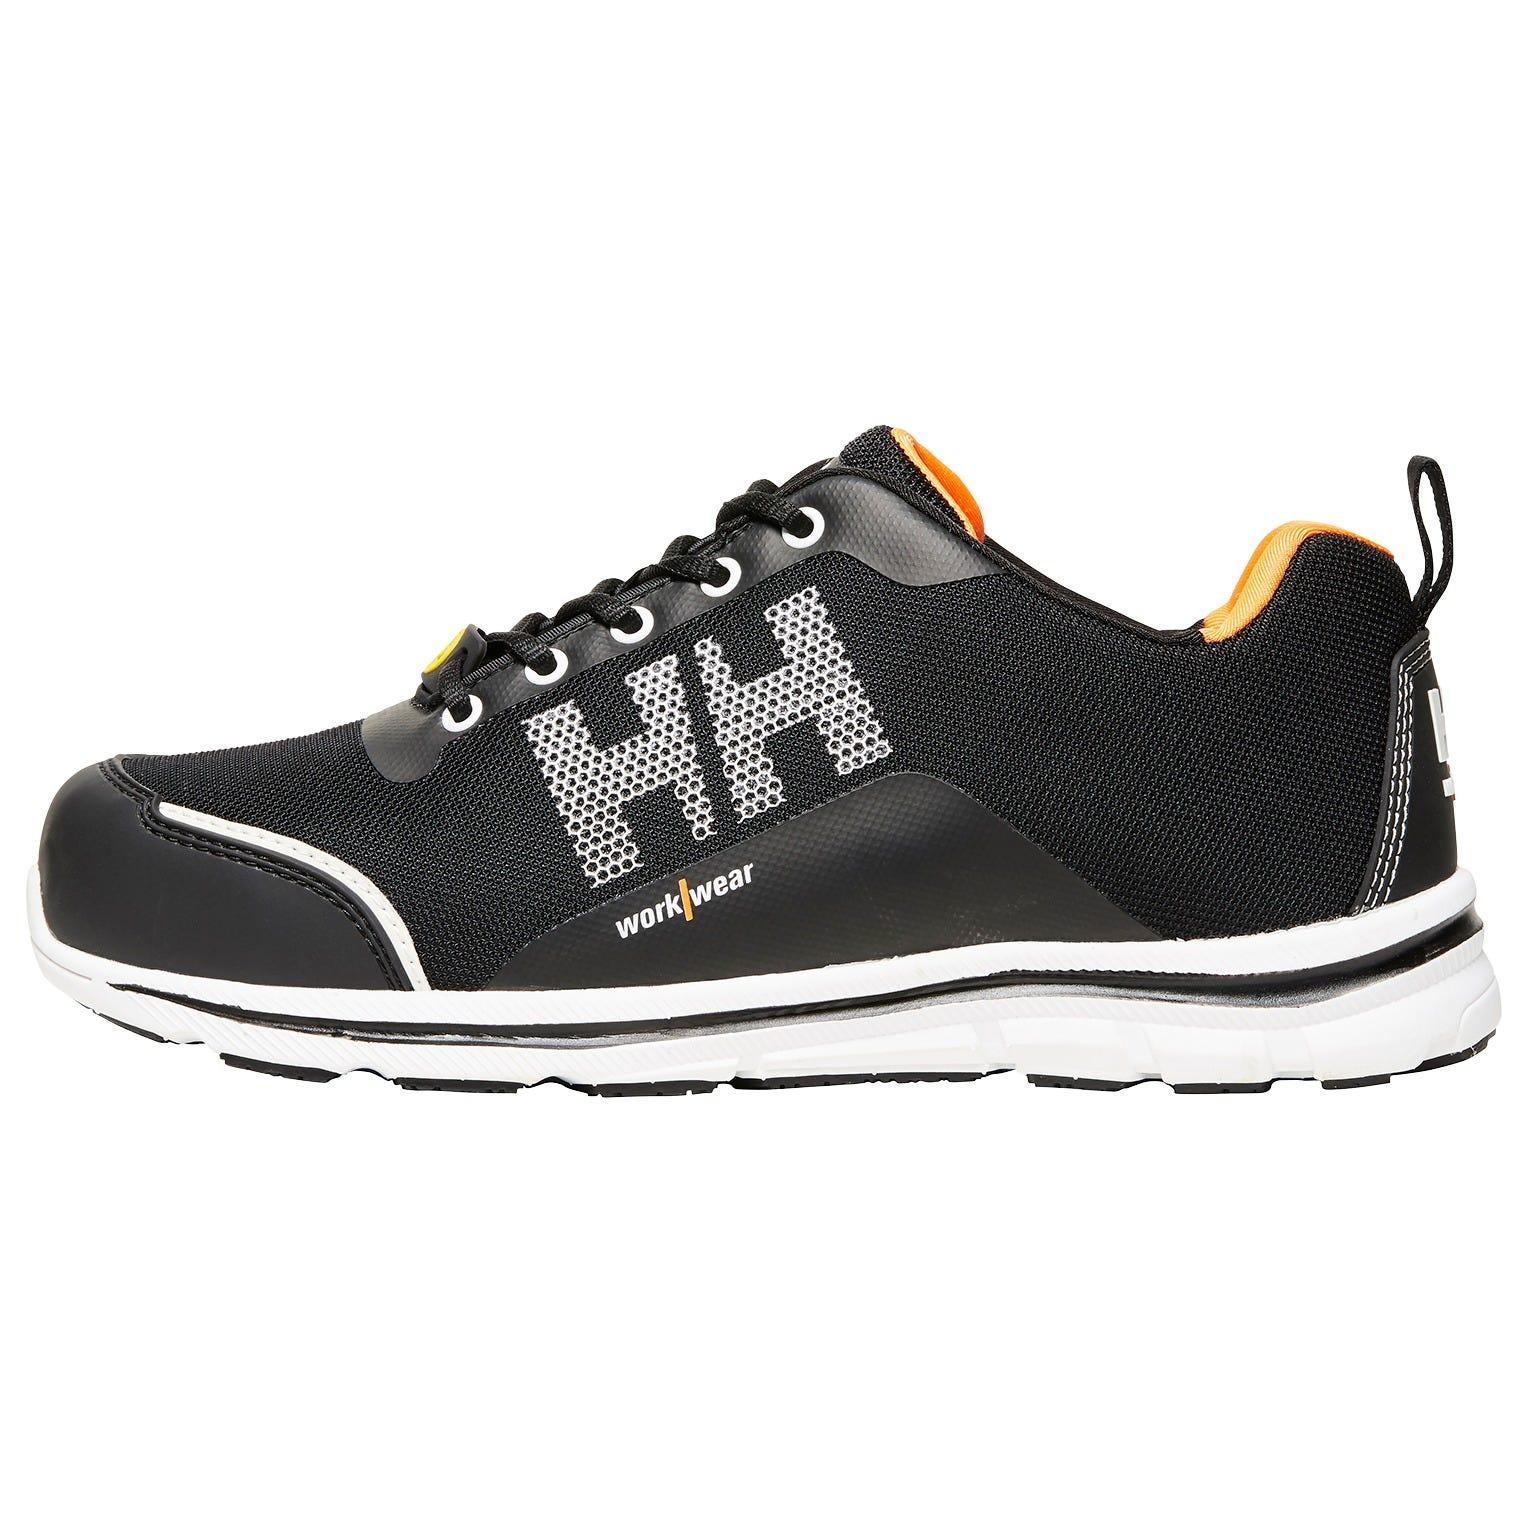 hh workwear workwear helly hansen scarpa antinfortunistica oslo certificata s3 con punta in alluminio 47 nero